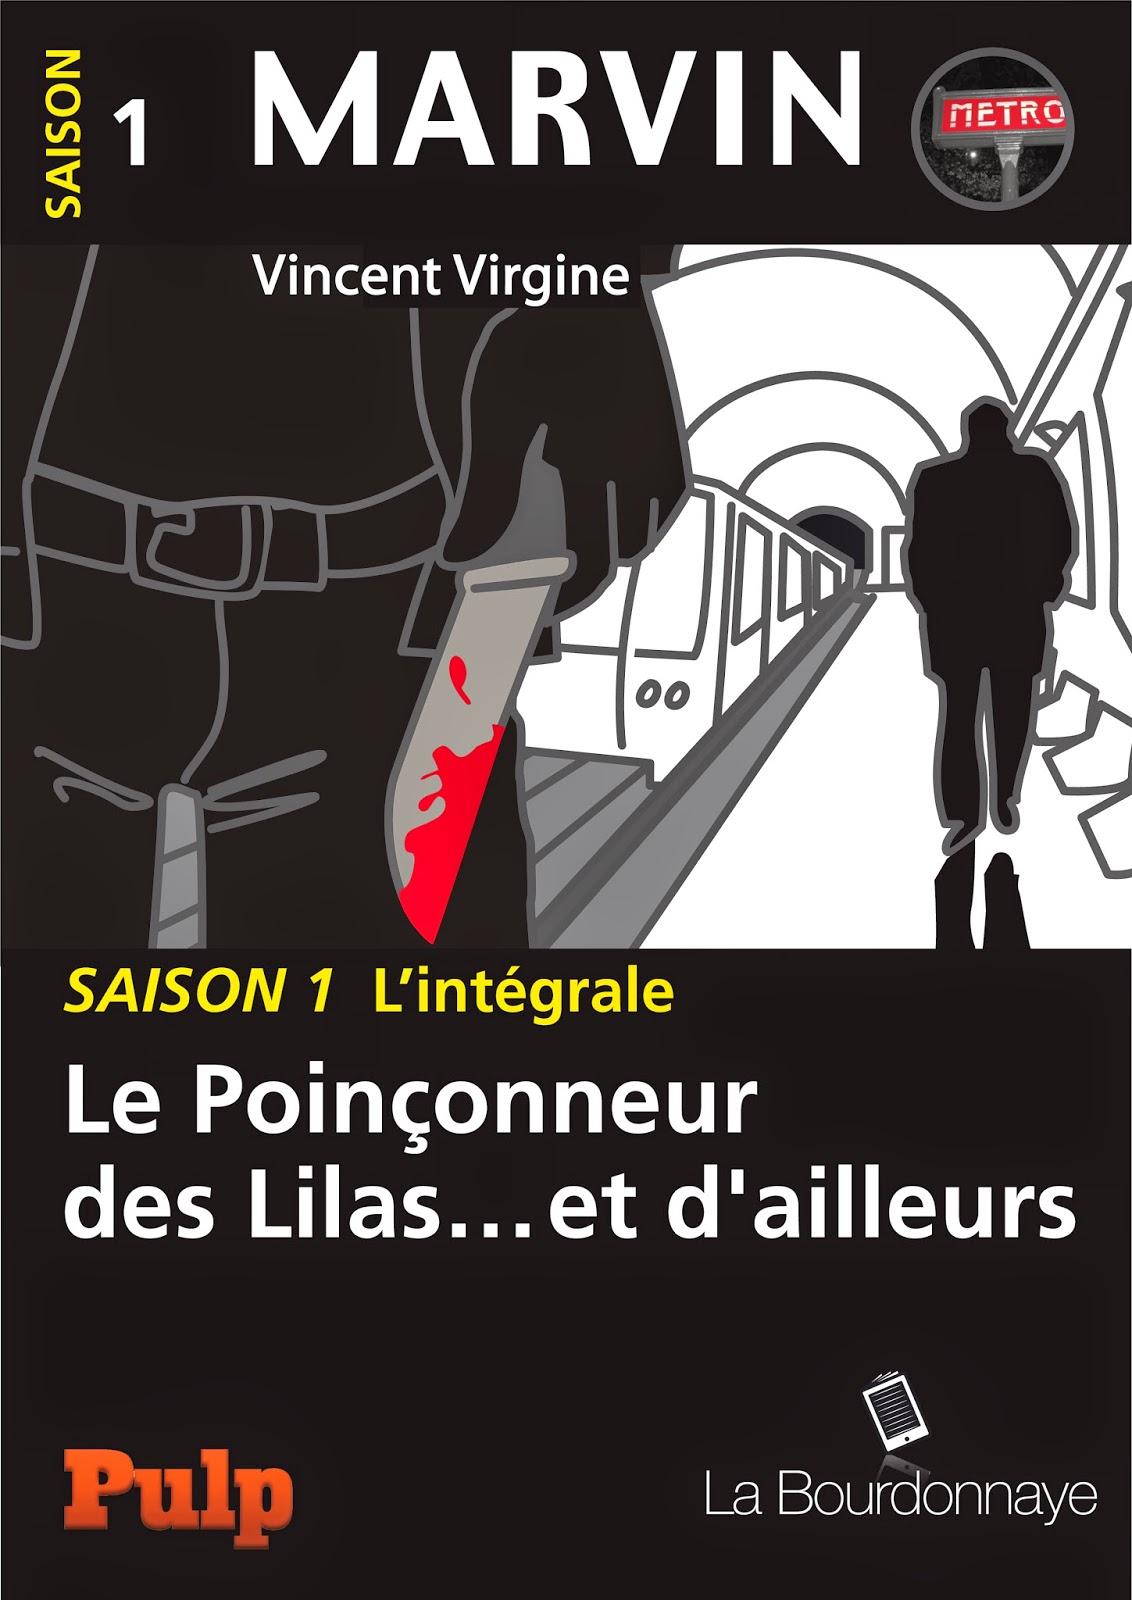 http://lesreinesdelanuit.blogspot.fr/2014/06/marvin-saison-1-de-vincent-virgine.html